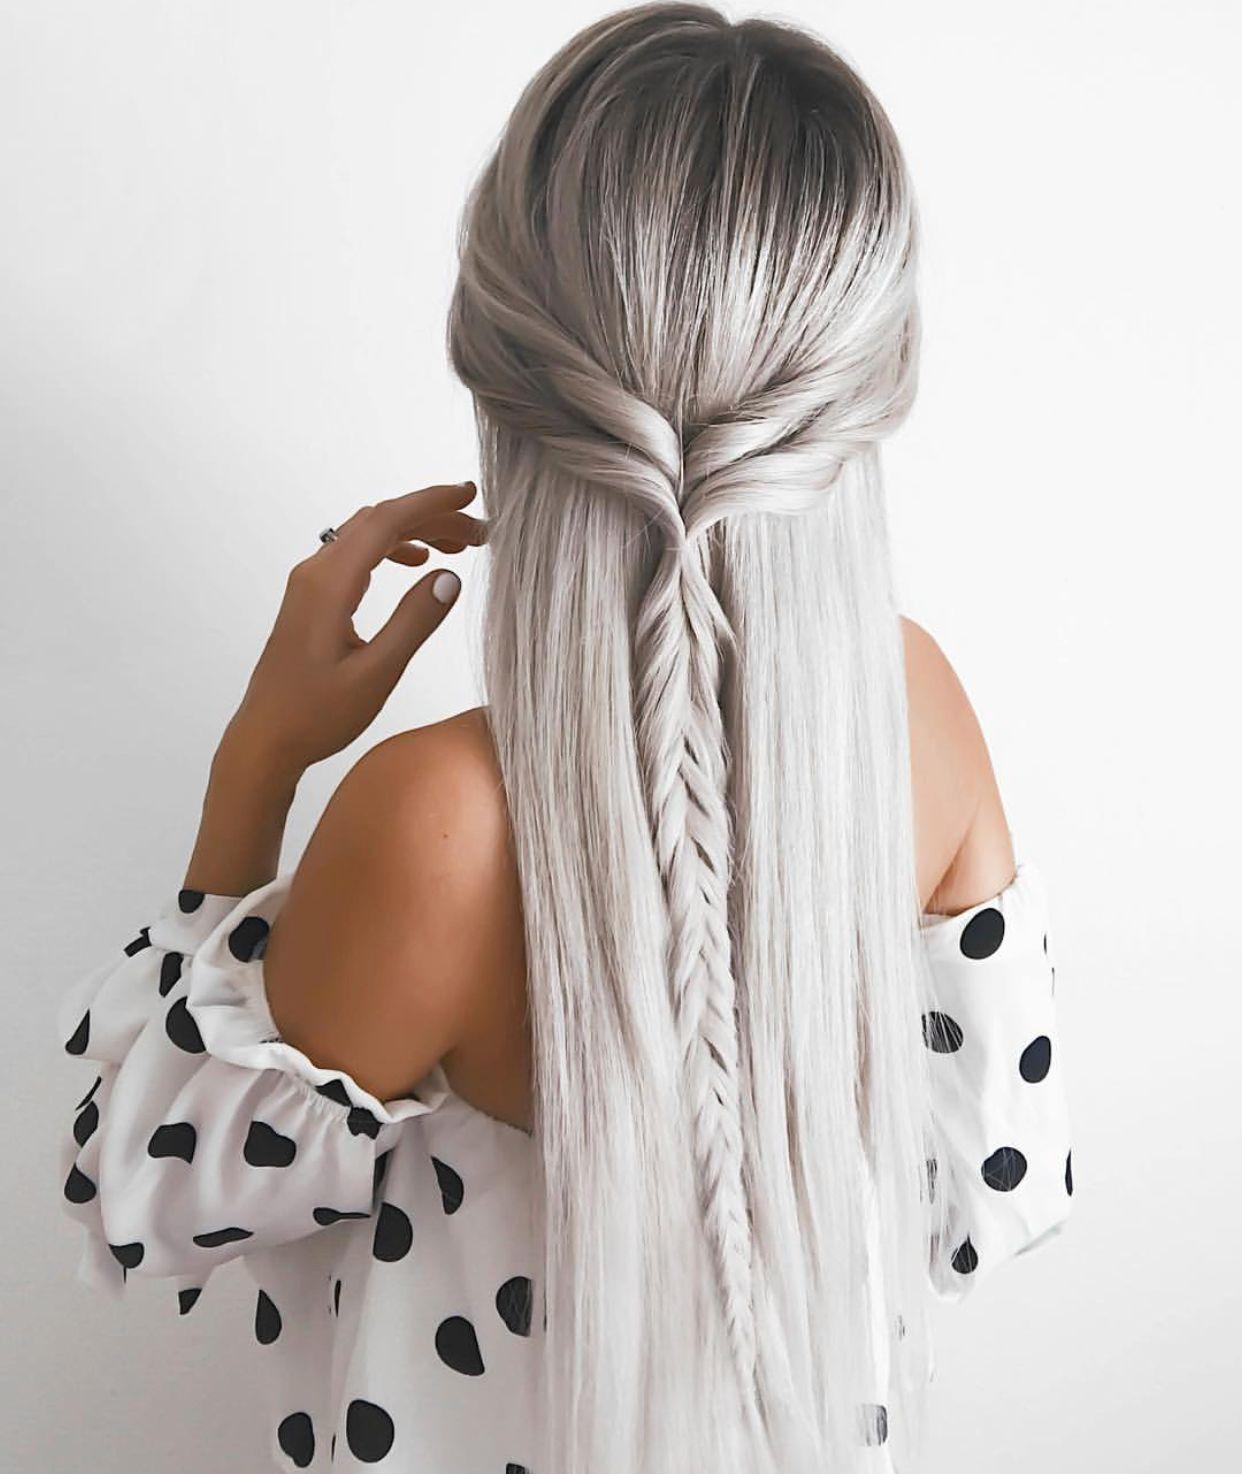 Pinterest kat g new hair ideas pinterest hair style hair